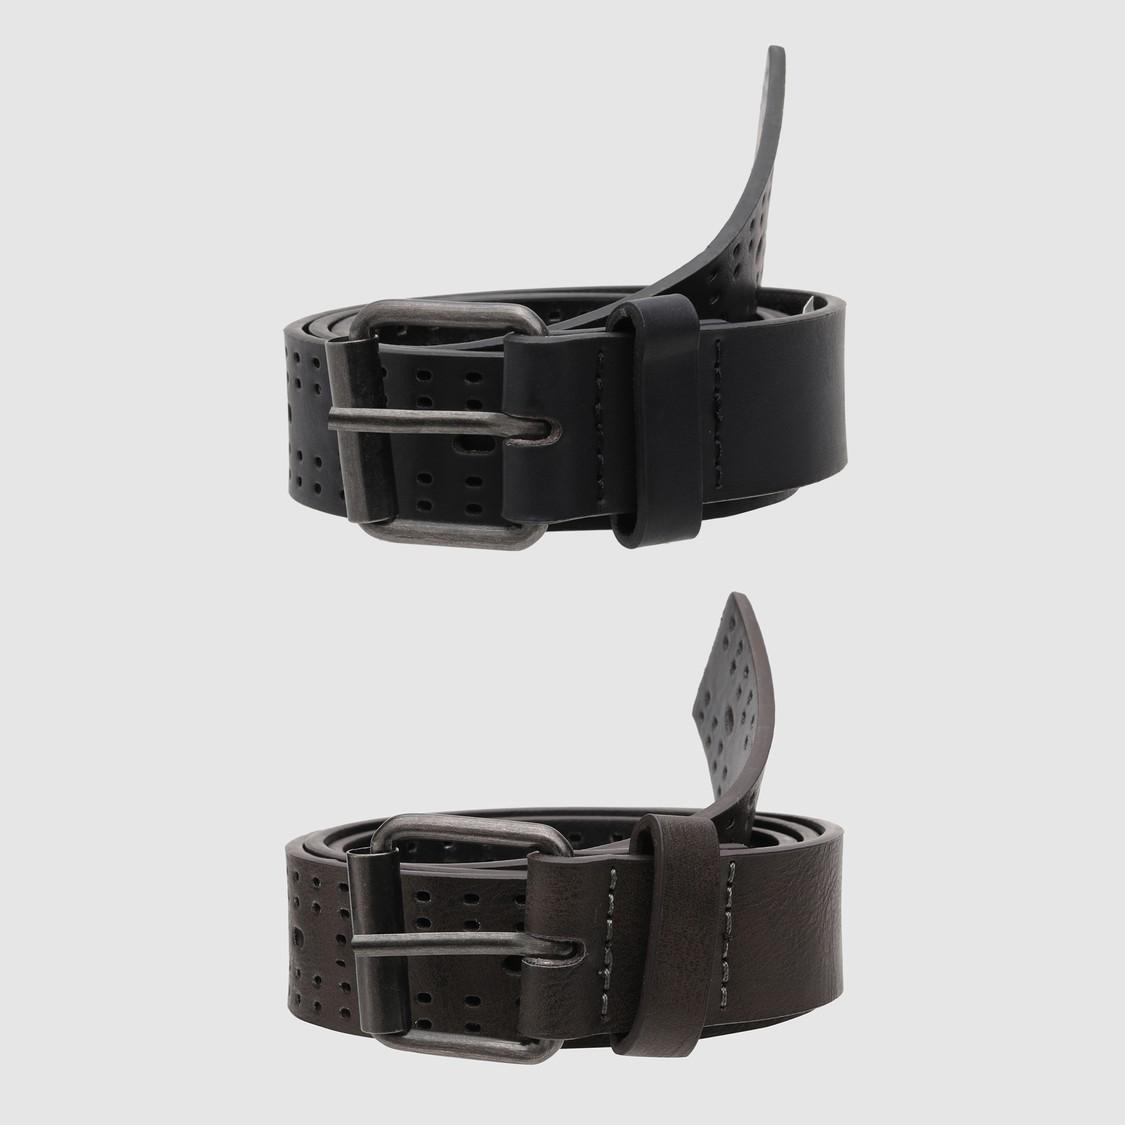 Textured Casual Belt wit Cutwork Detailing